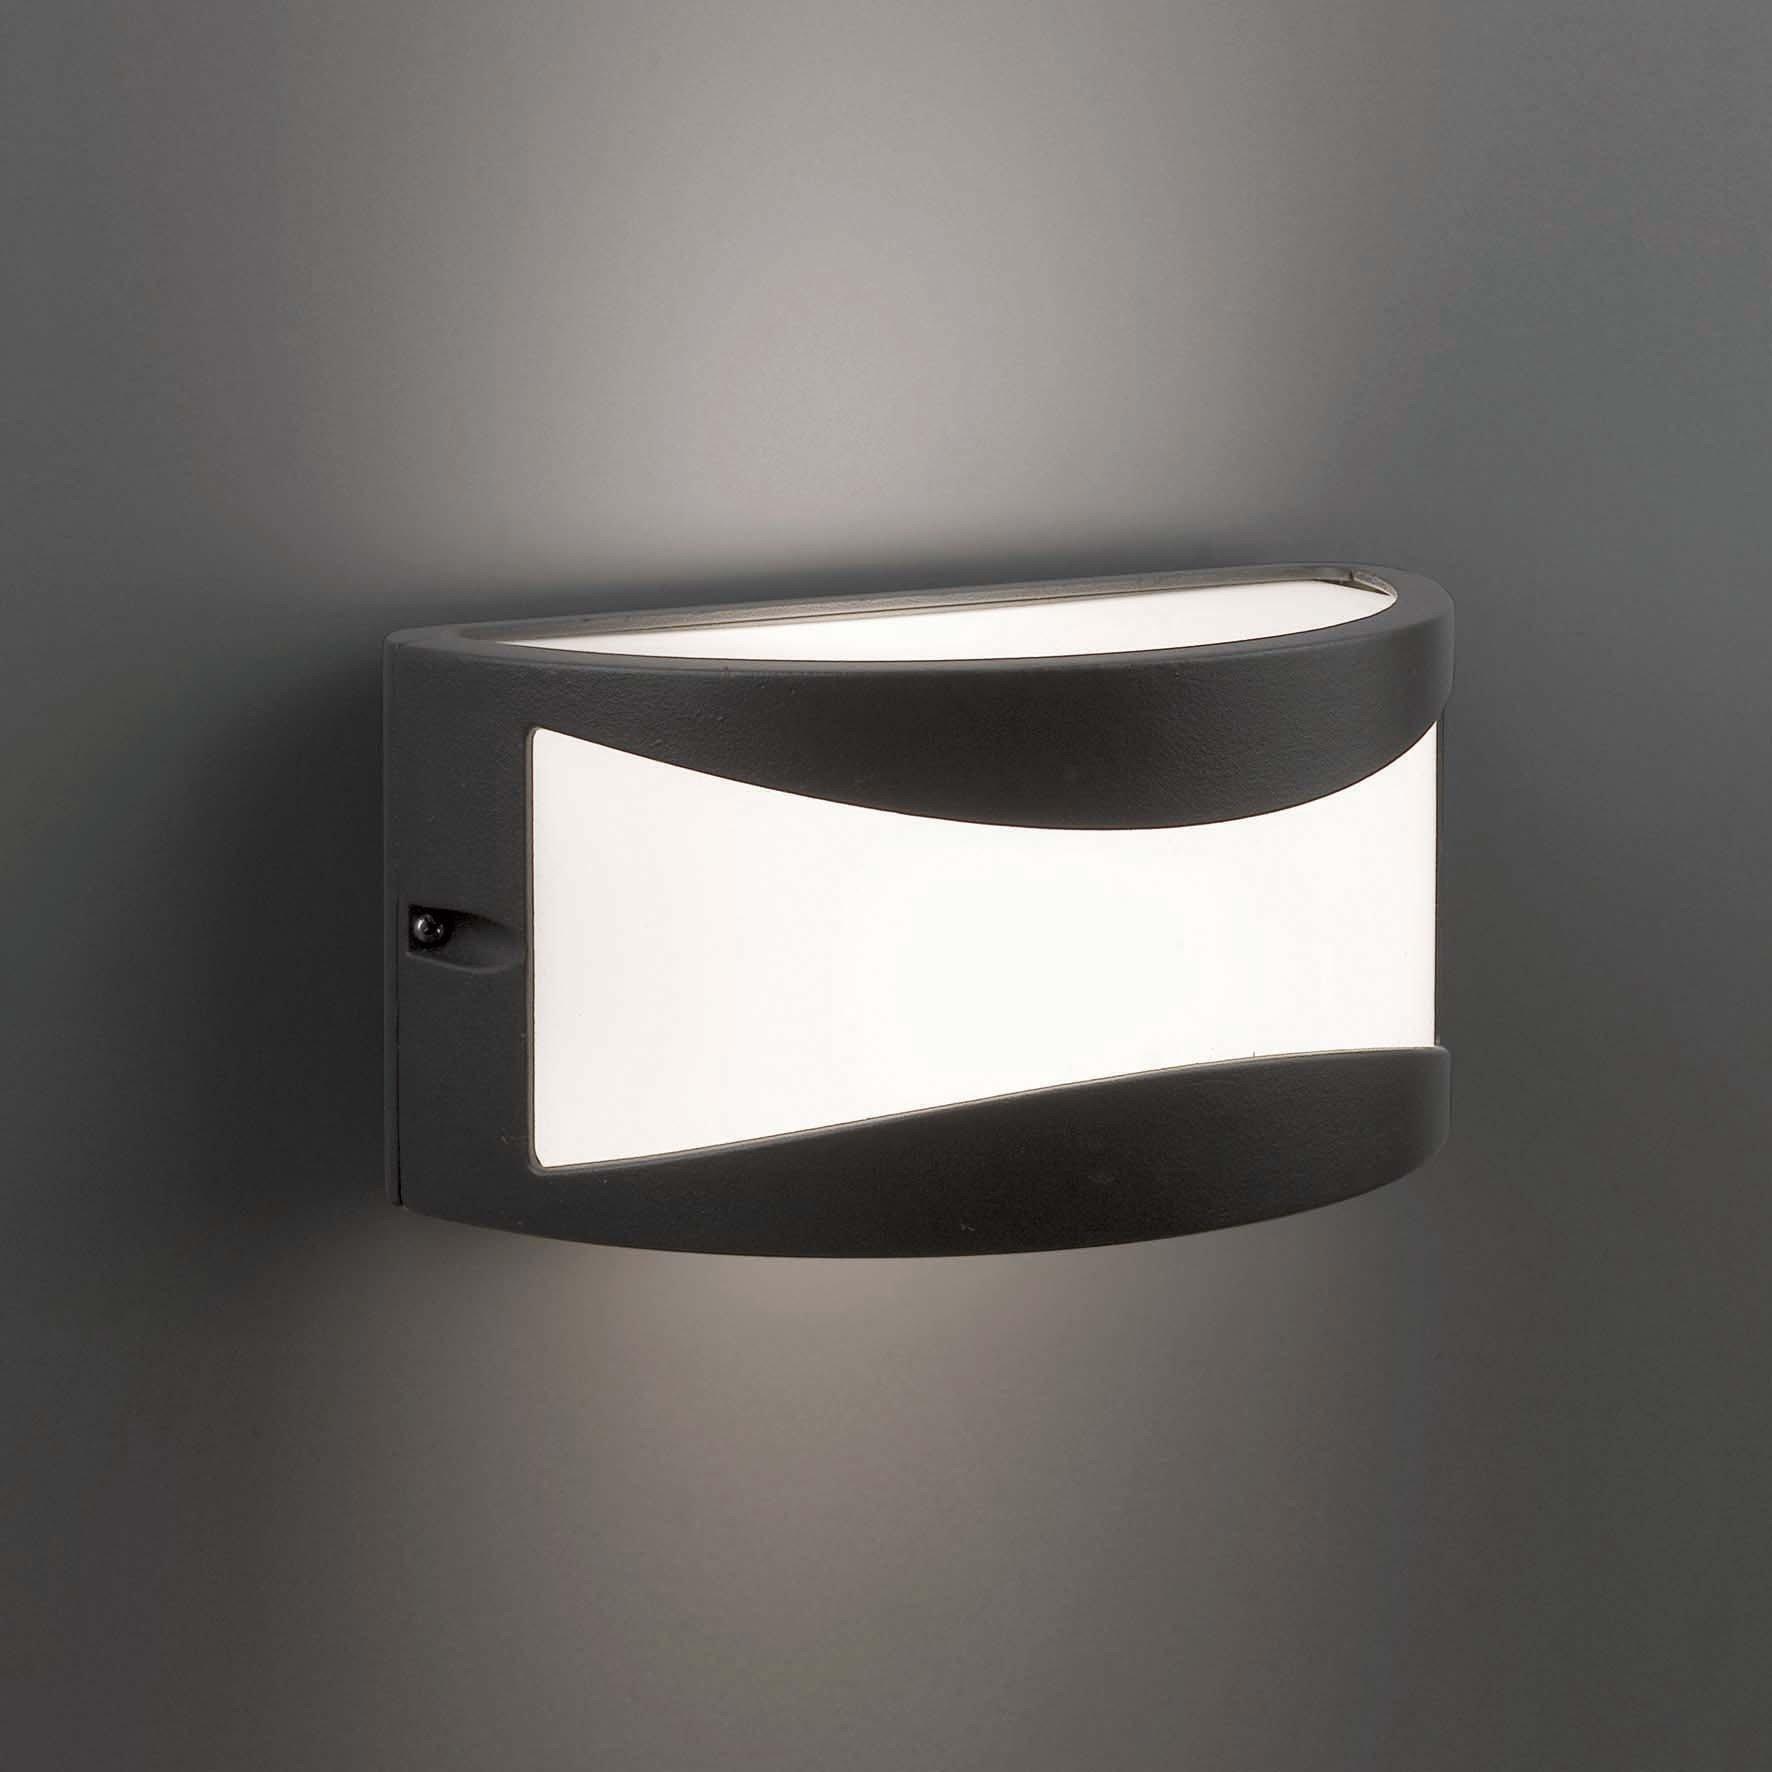 Faro bonn l mpara aplique gris oscuro 70702 iluminaci n for Apliques iluminacion exterior pared